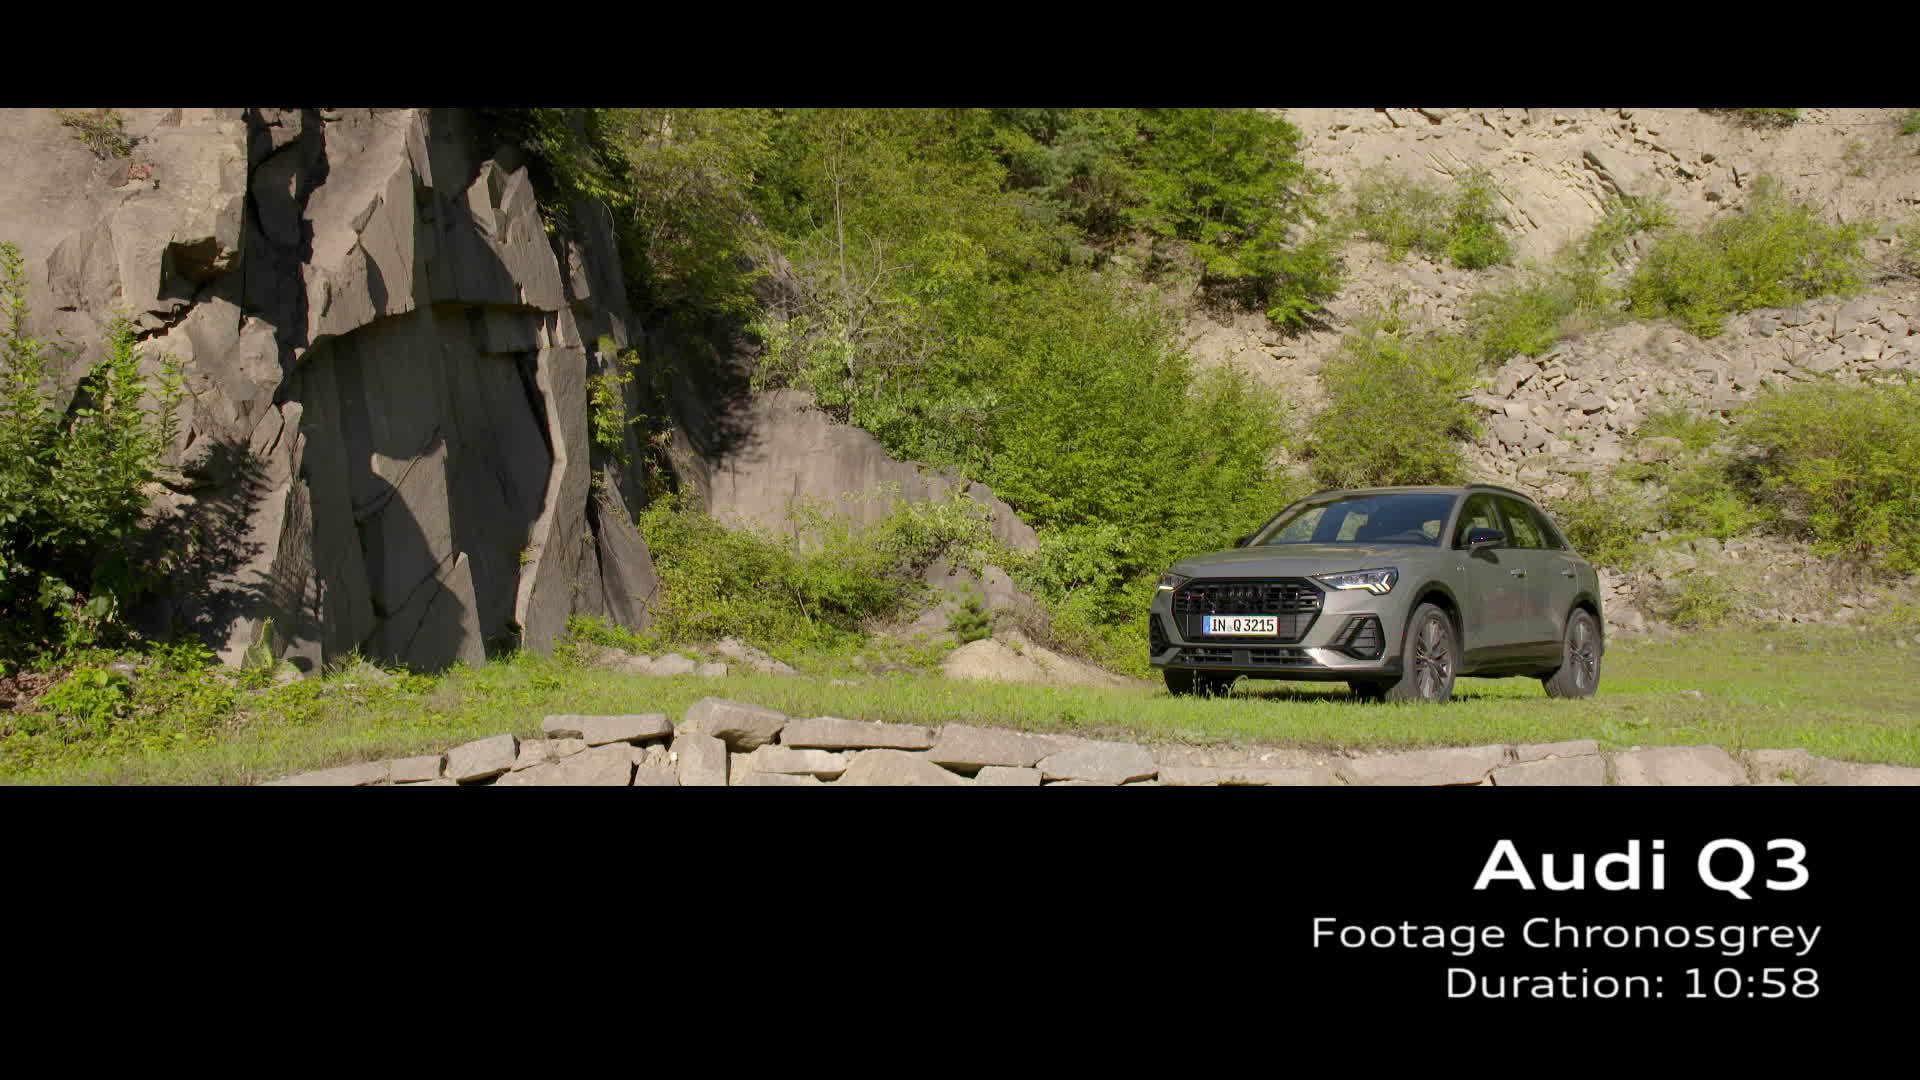 Audi Q3 Footage Chronos grey (2018)